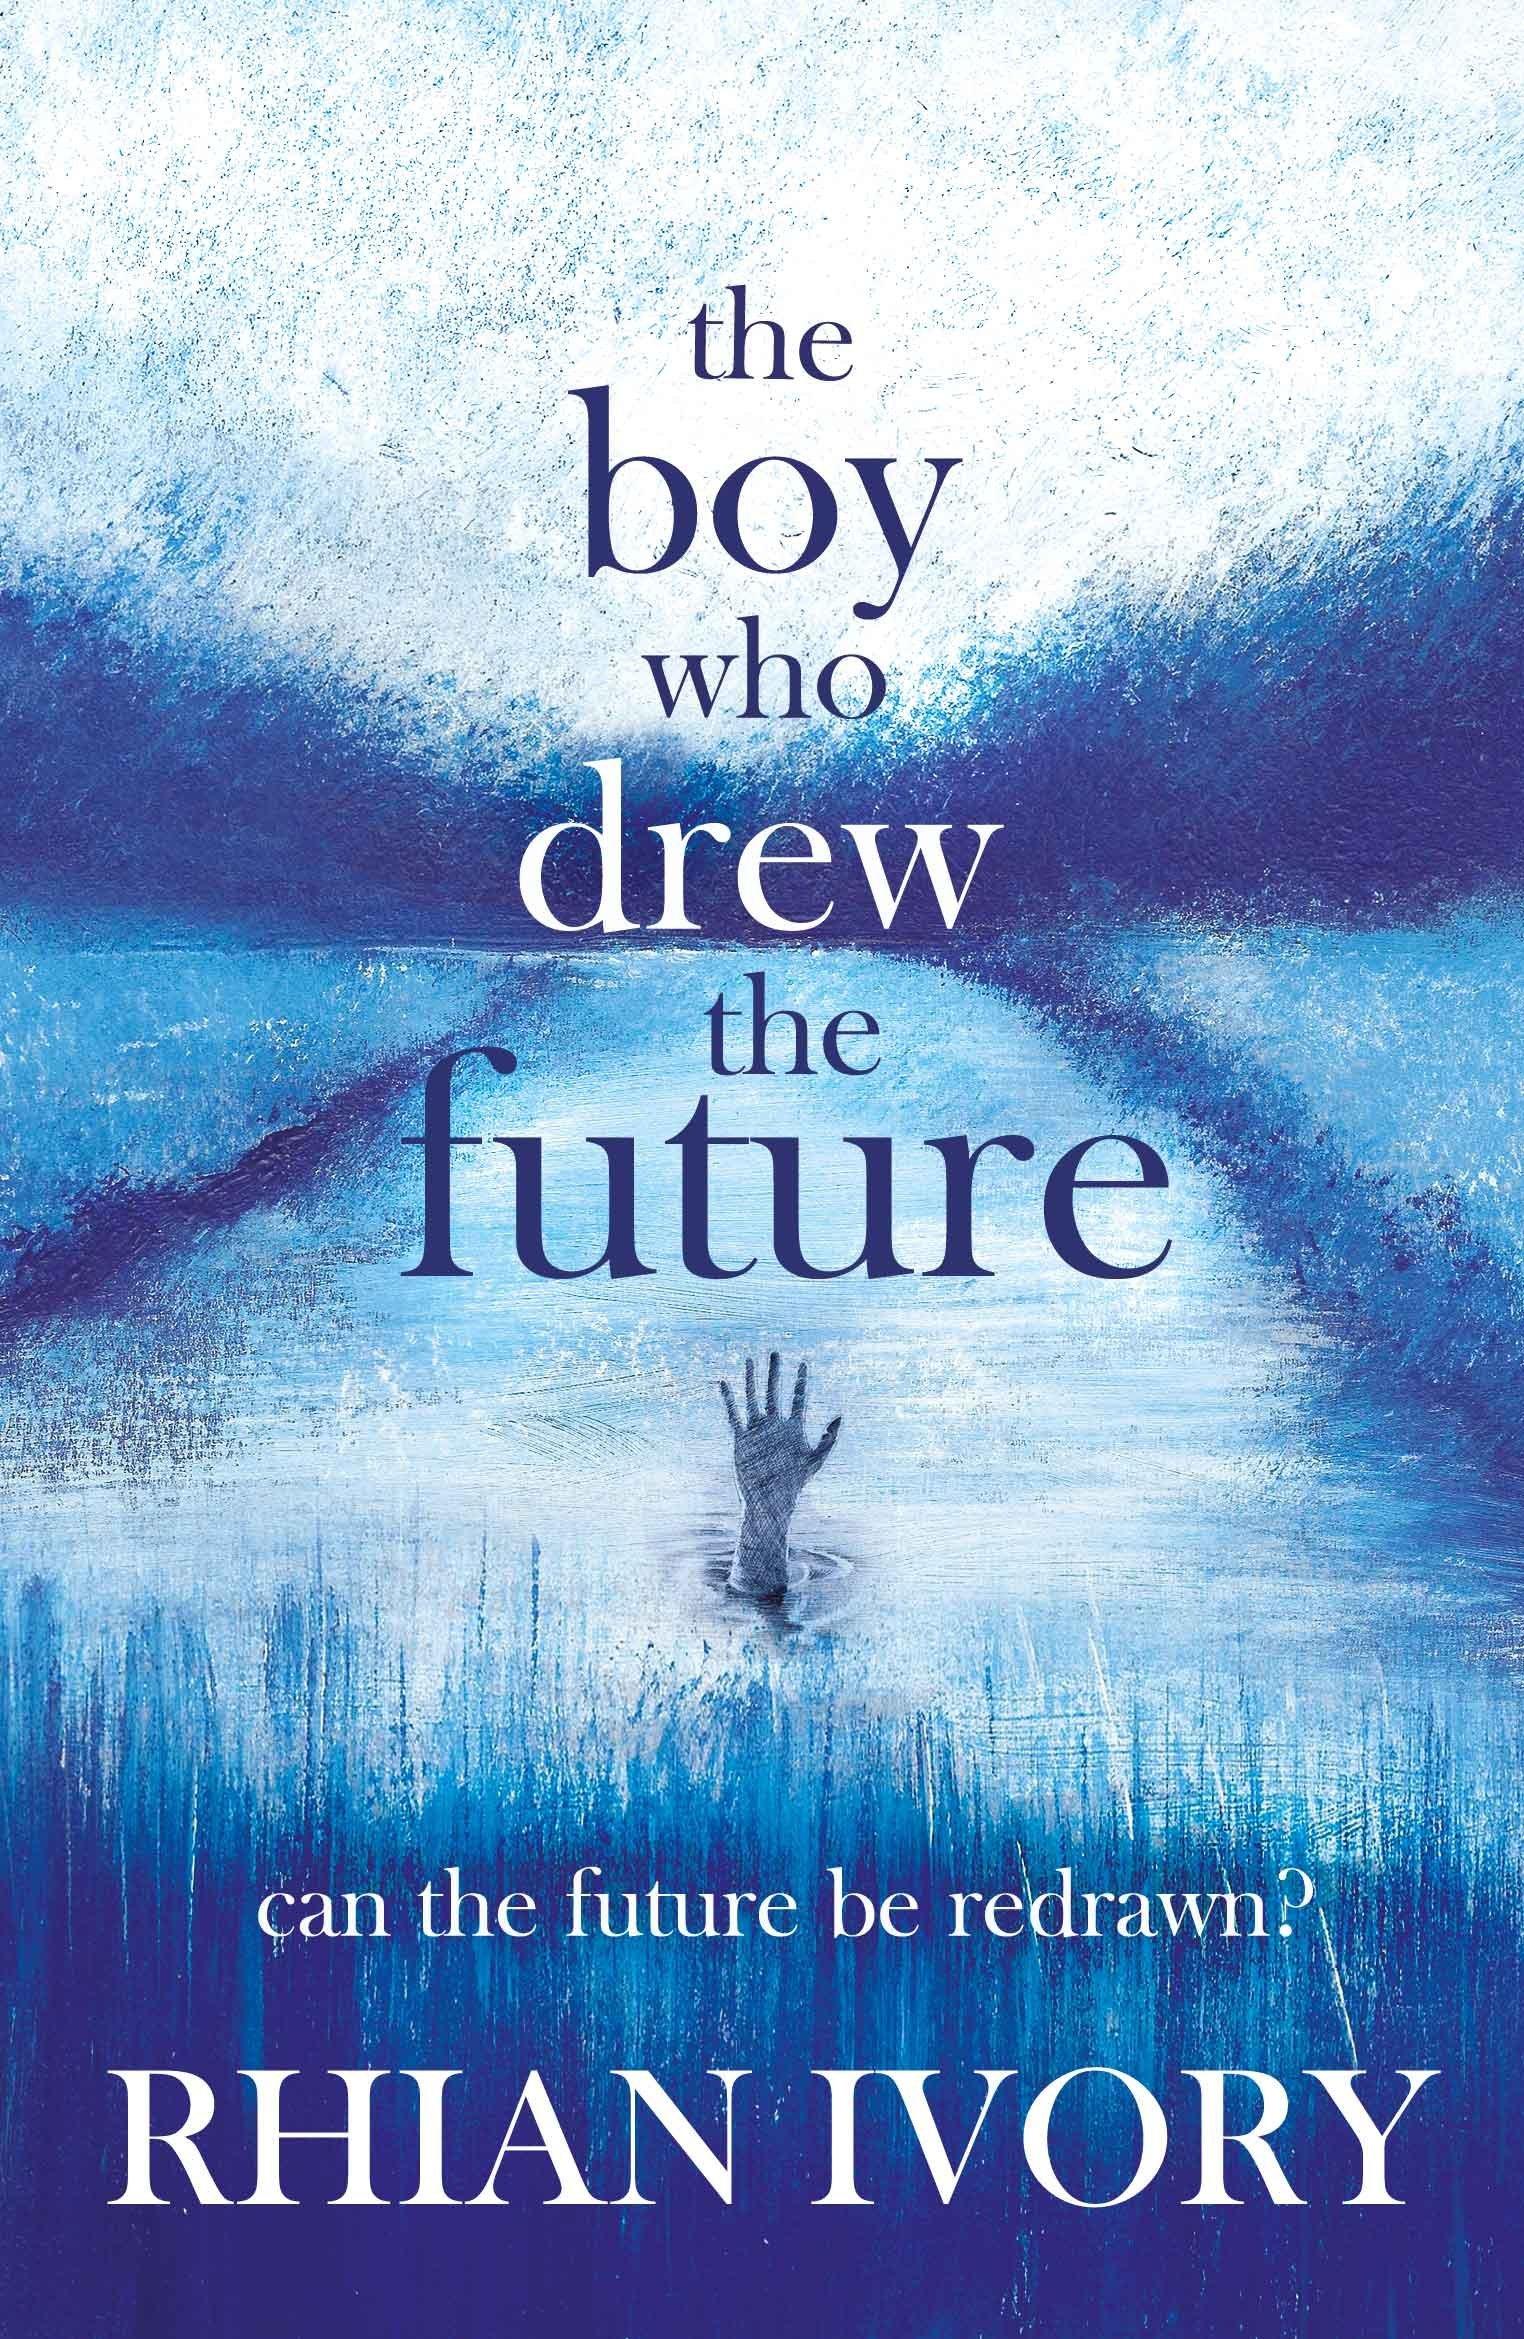 The Boy Who Drew the Future  by  Rhian Ivory